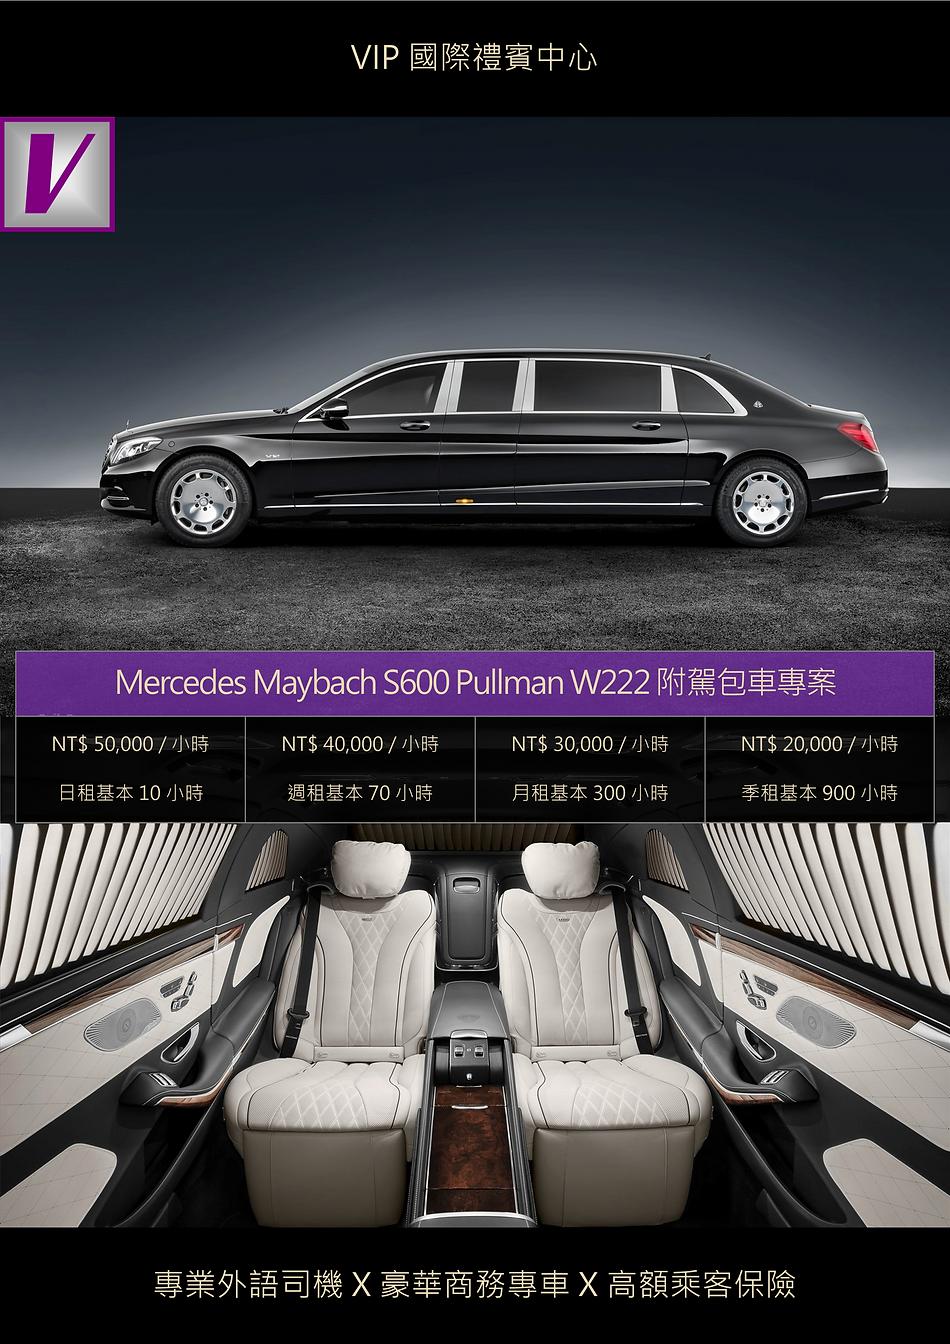 VIP國際禮賓中心 MERCEDES MAYBACH S600 PULLMAN W222 附駕包車專案 DM.png